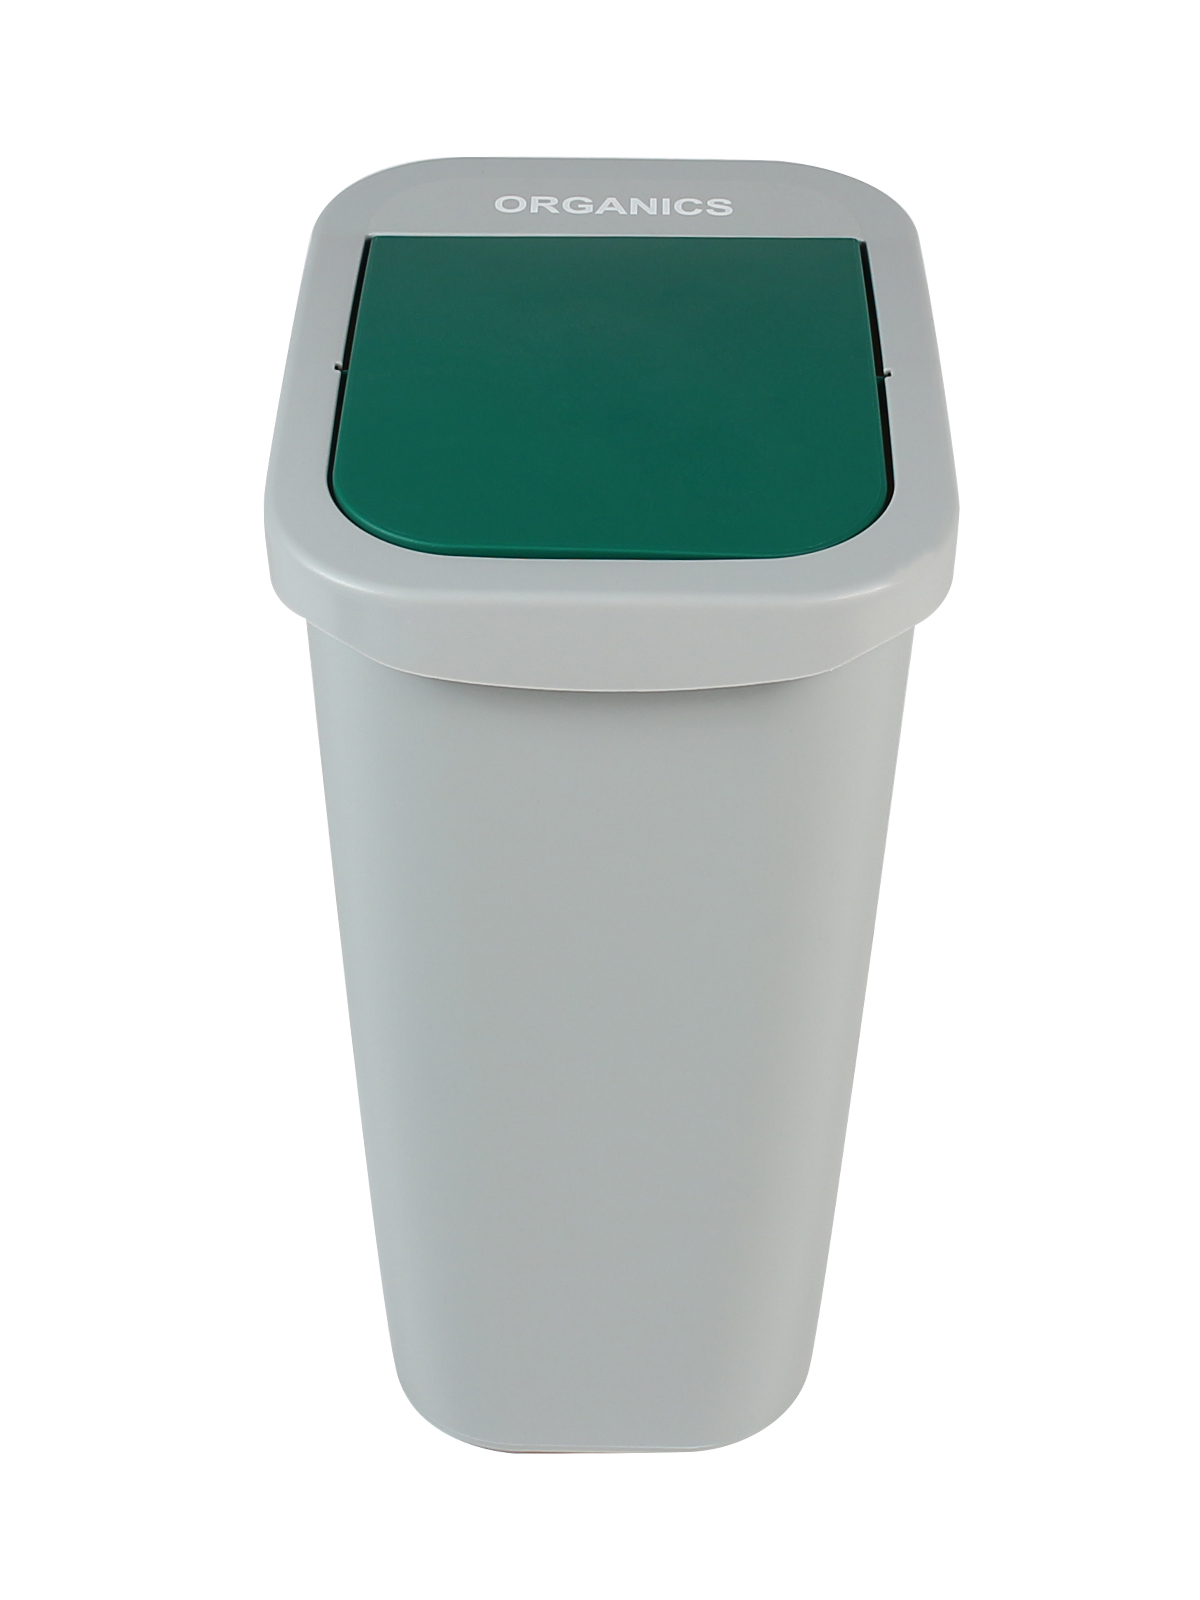 BILLI BOX - Single - 10 G - Organics - Swing - Grey-Green